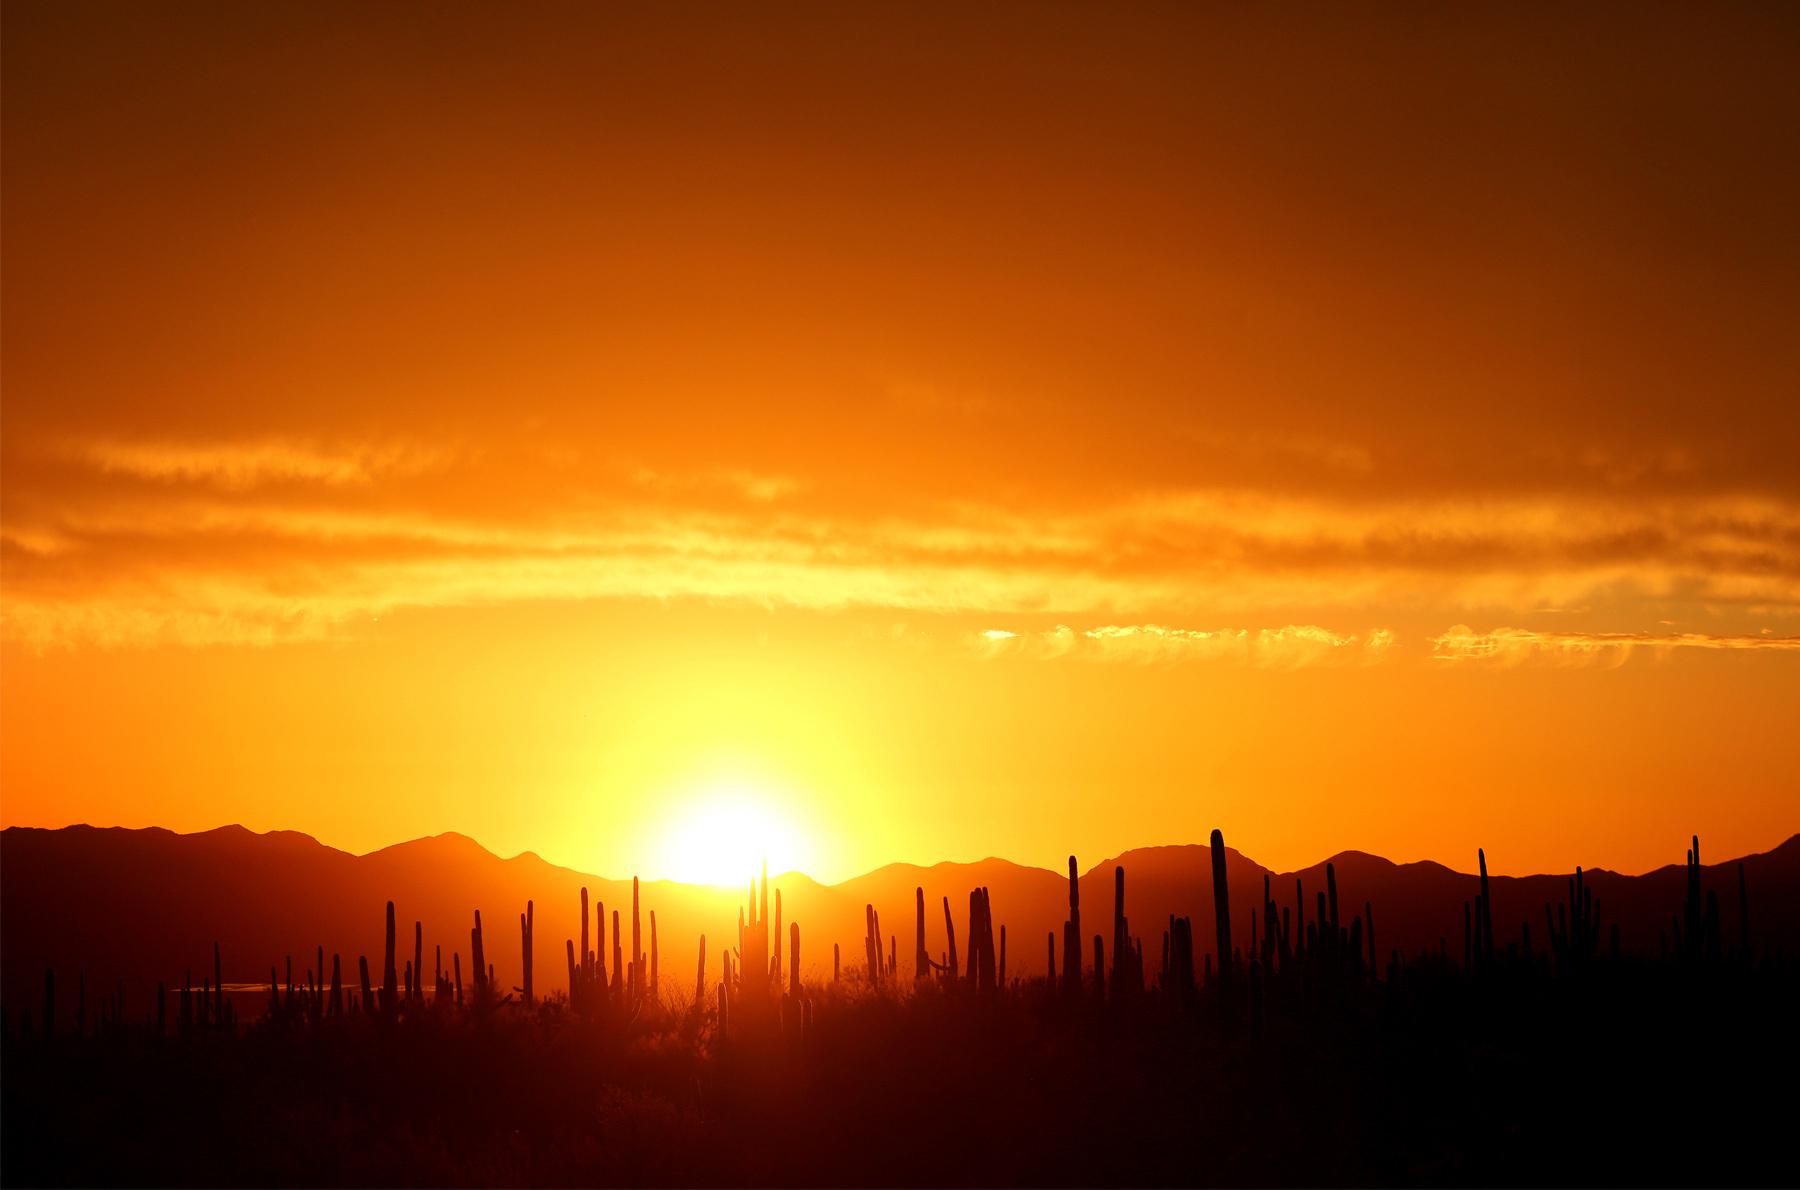 15-Tuscan-Arizona-Wedding-Photography-by-Vick-Photography-Destination-Wedding-Desert-Old-Tucson-Studios-Cactus-Sunset-Night-Photography-Elsa-and-Arthur.jpg